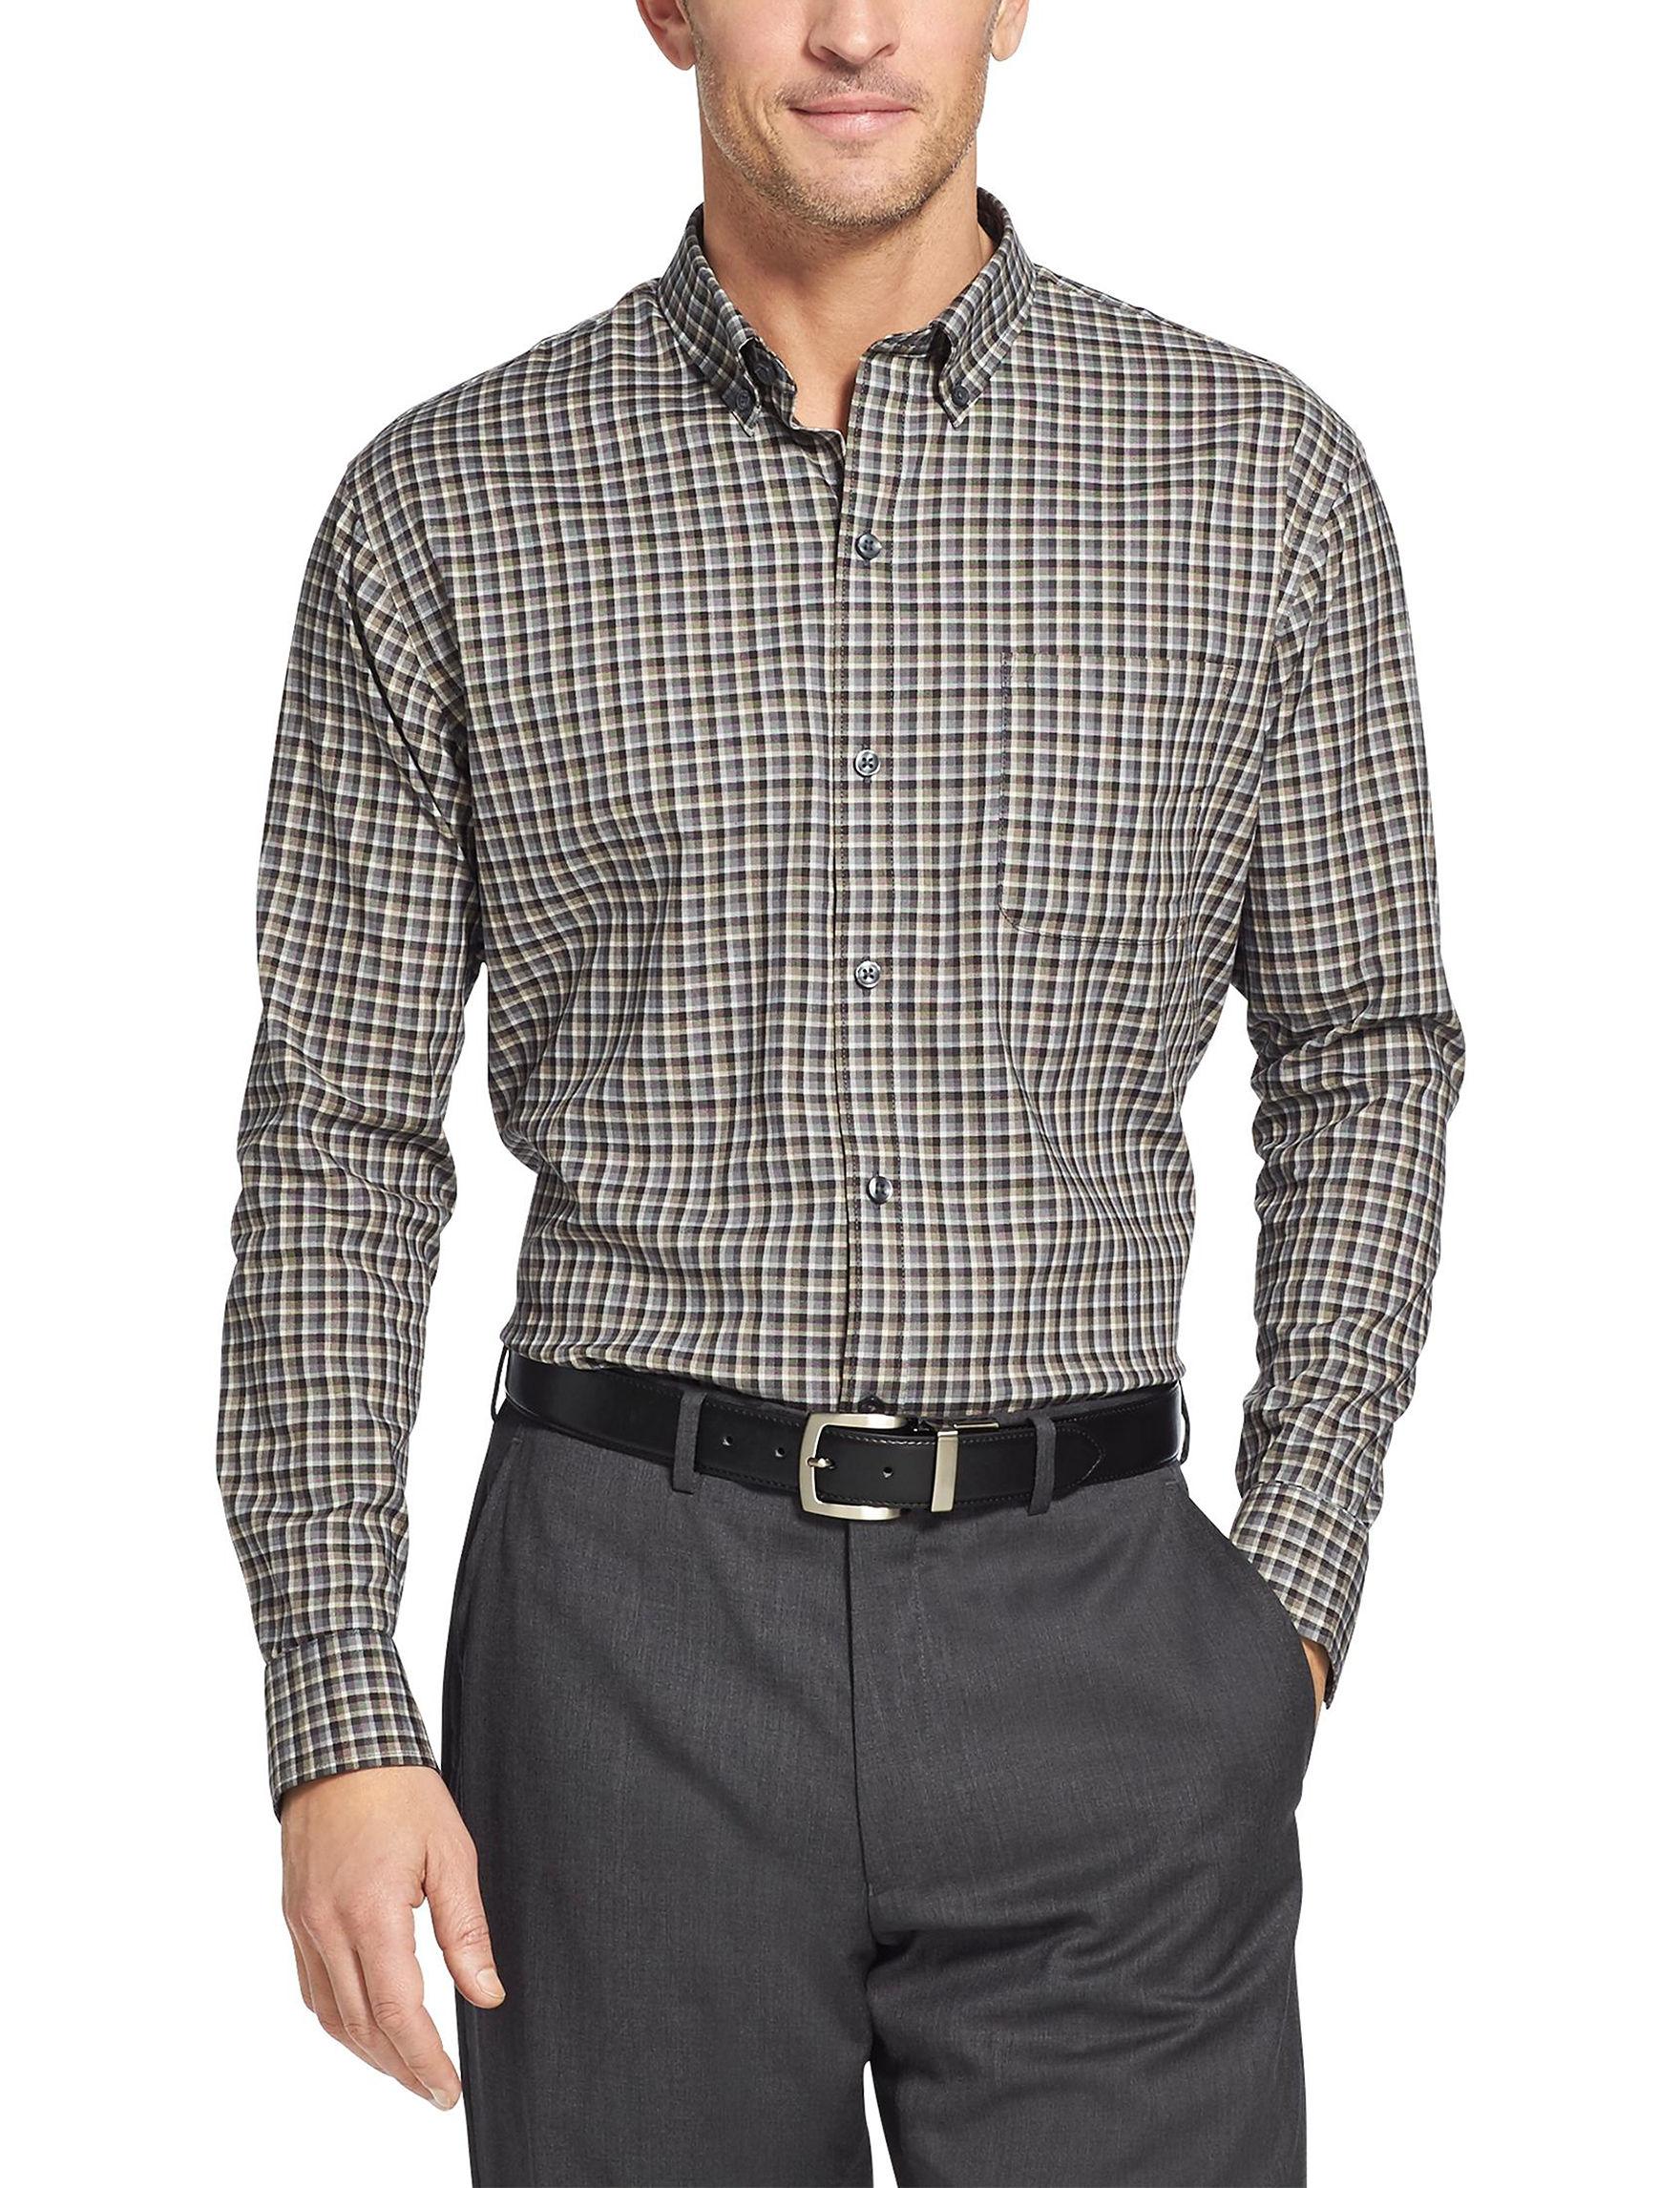 Van Heusen Grey Plaid Casual Button Down Shirts